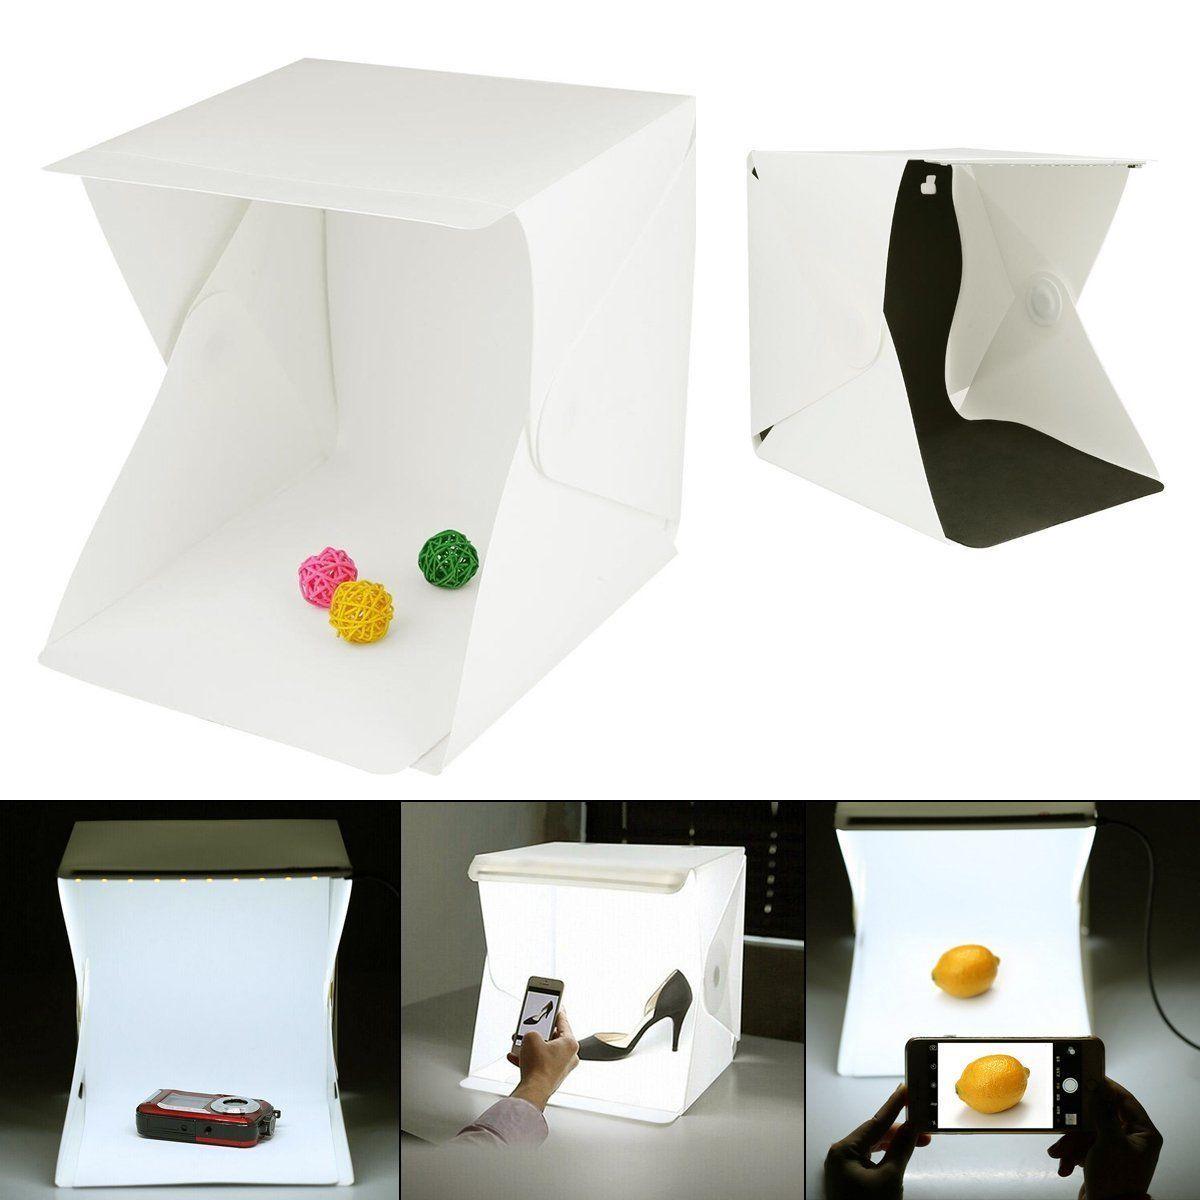 682 Mini Light Room Photo Studio 9 Photography Lighting Tent